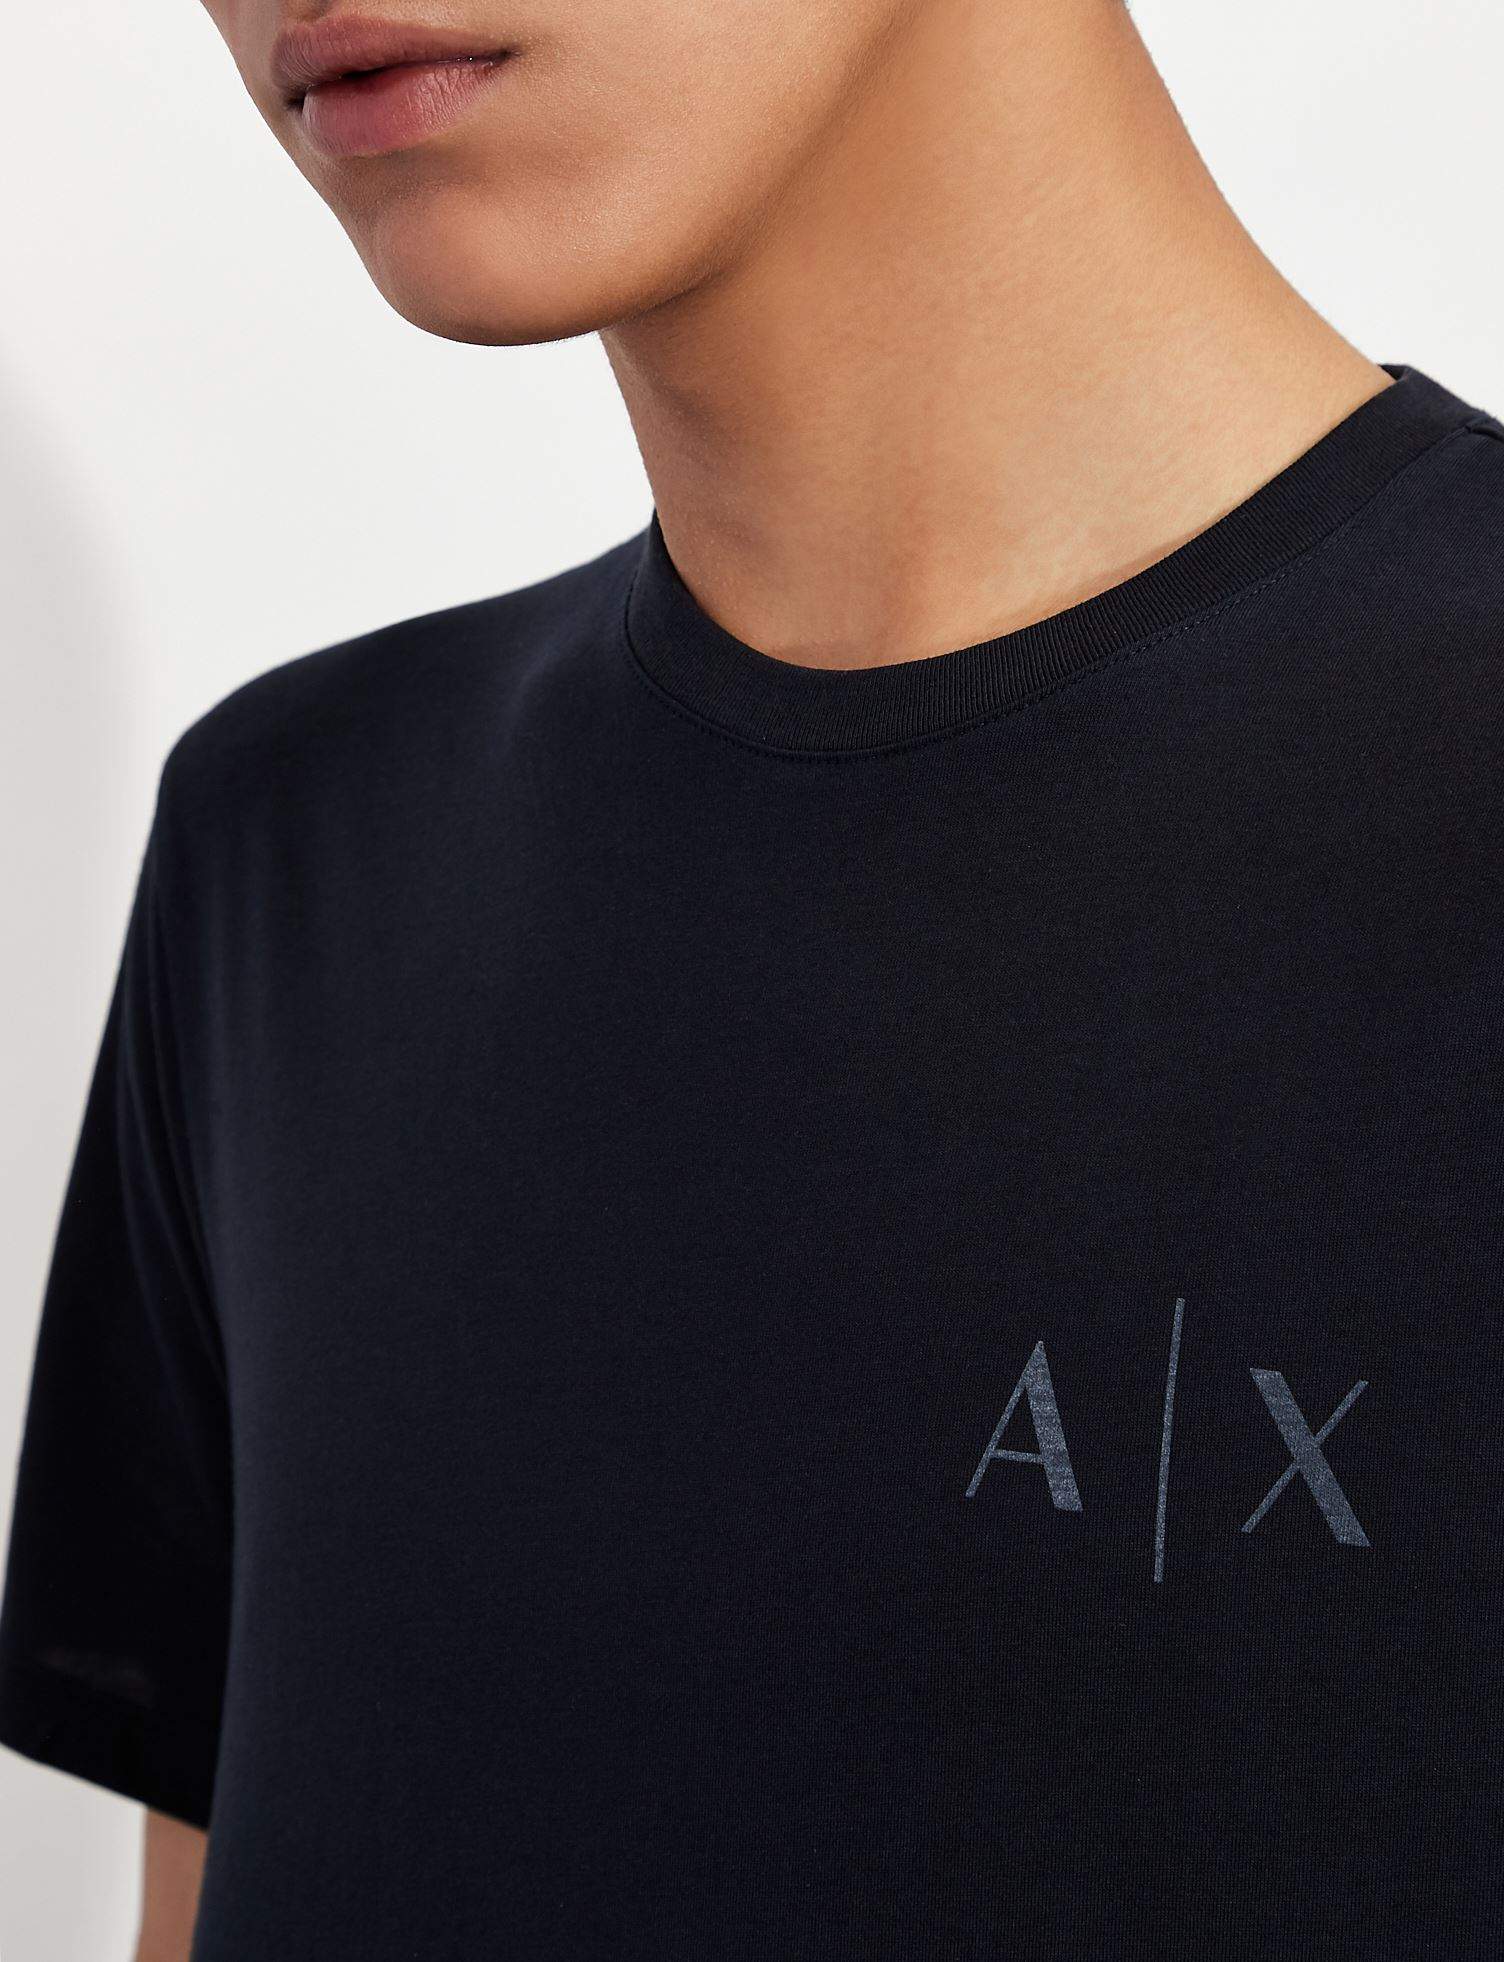 T-shirt regular fit Armani Exchange ARMANI EXCHANGE   T-shirt   3KZTGB-ZJBVZ1510